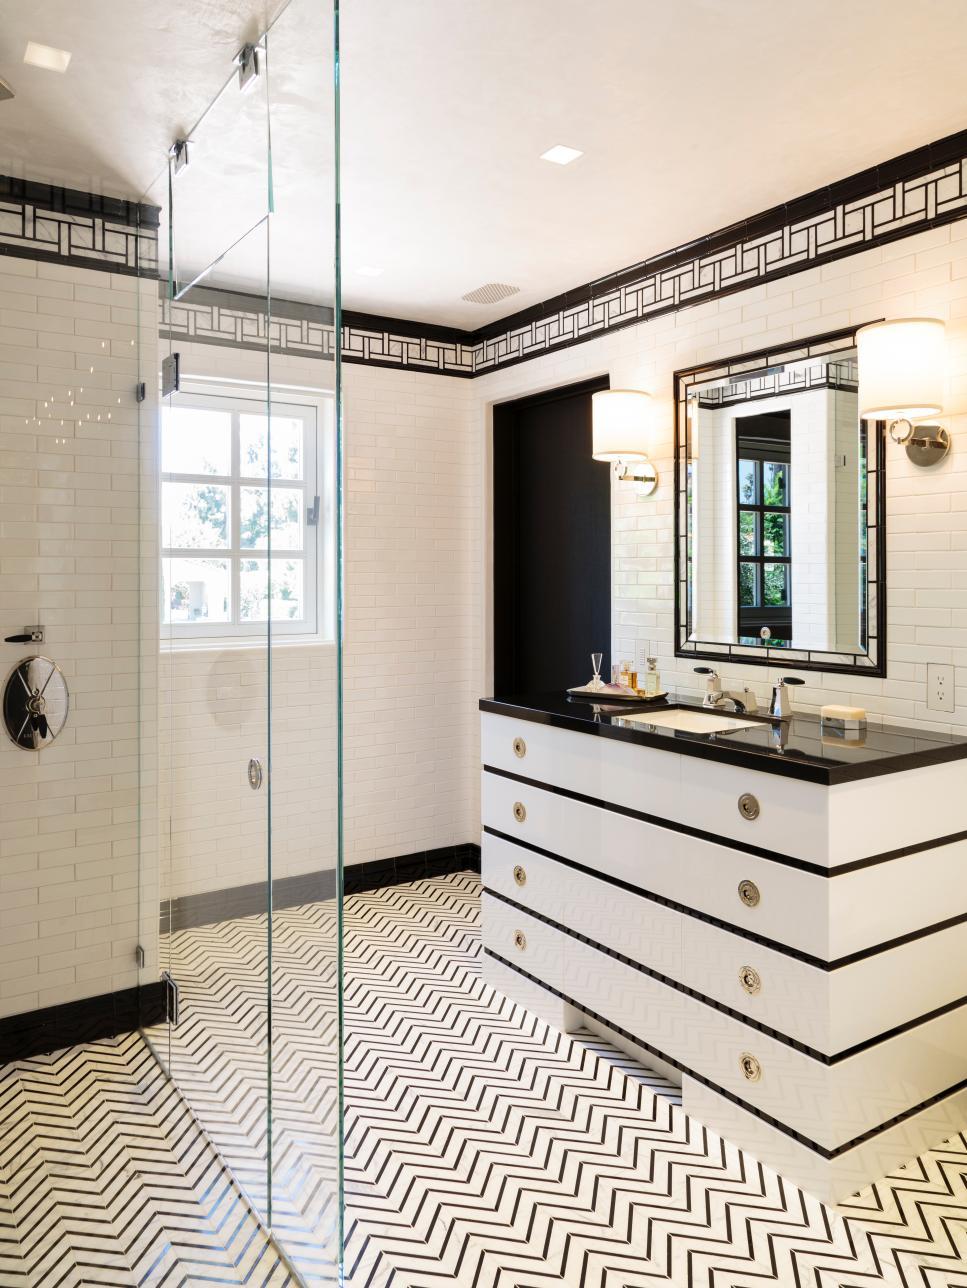 Bathroom Design Trend No Threshold Showers Hgtv